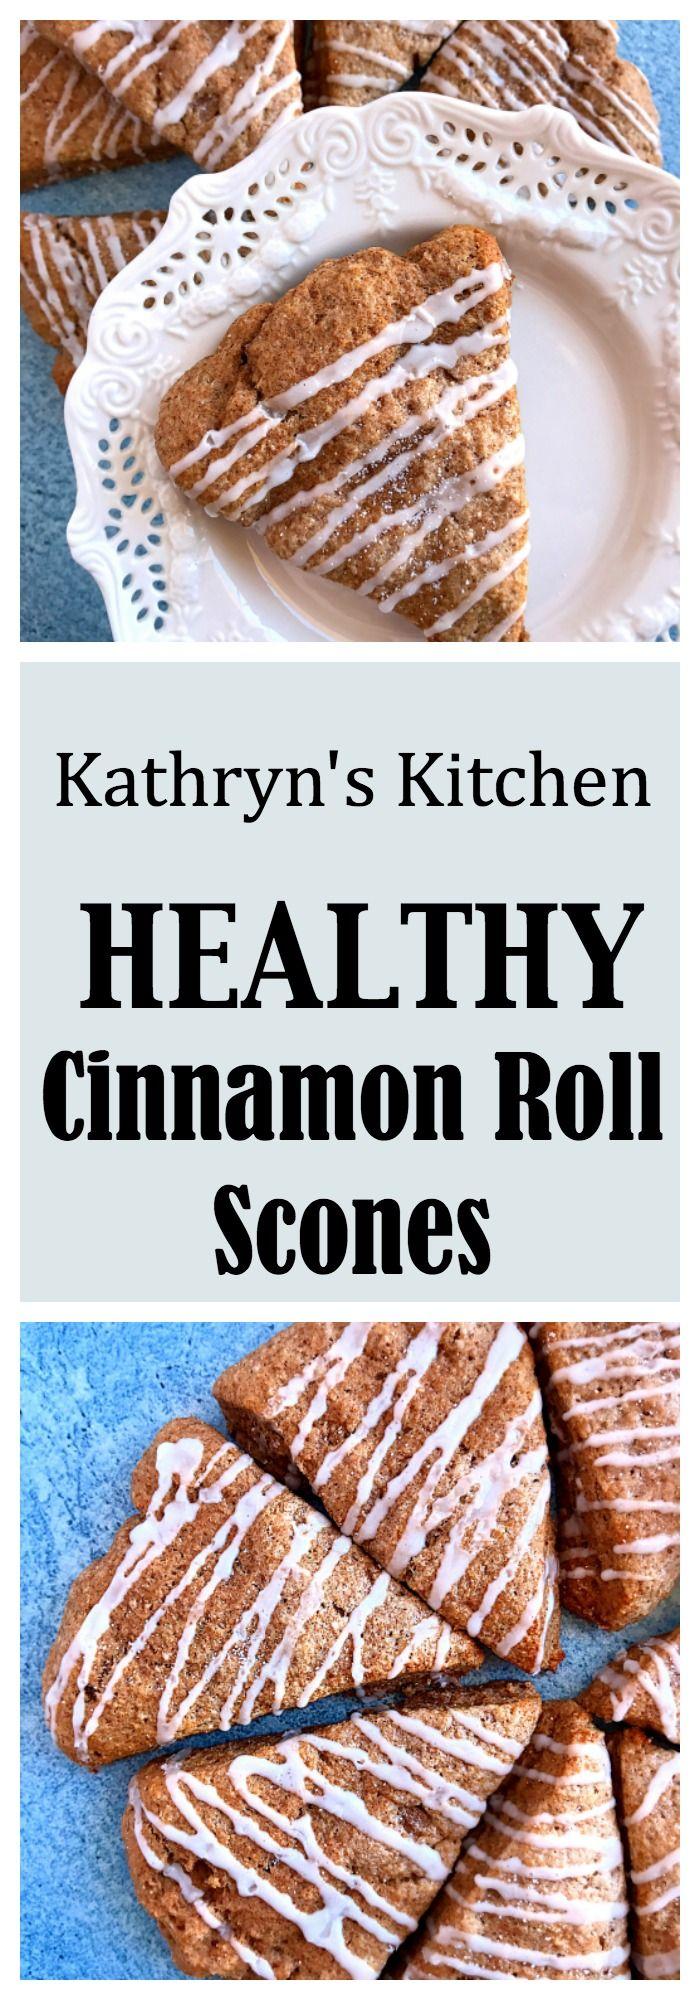 Healthy Cinnamon Roll Scones// Kathryn's Kitchen Blog